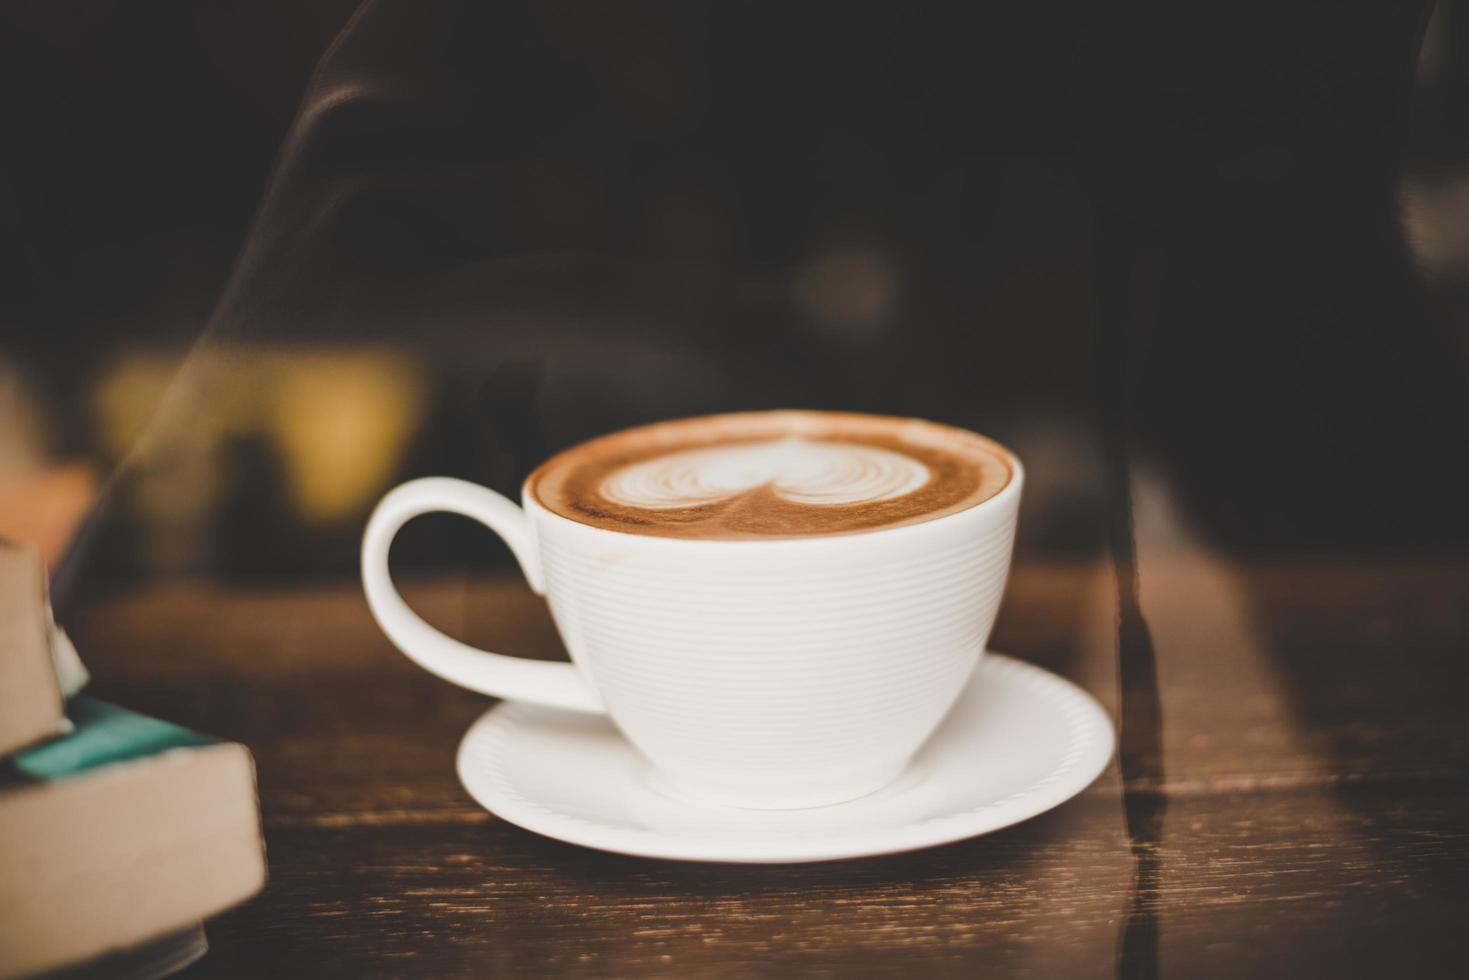 vintage toon kopje hete latte foto